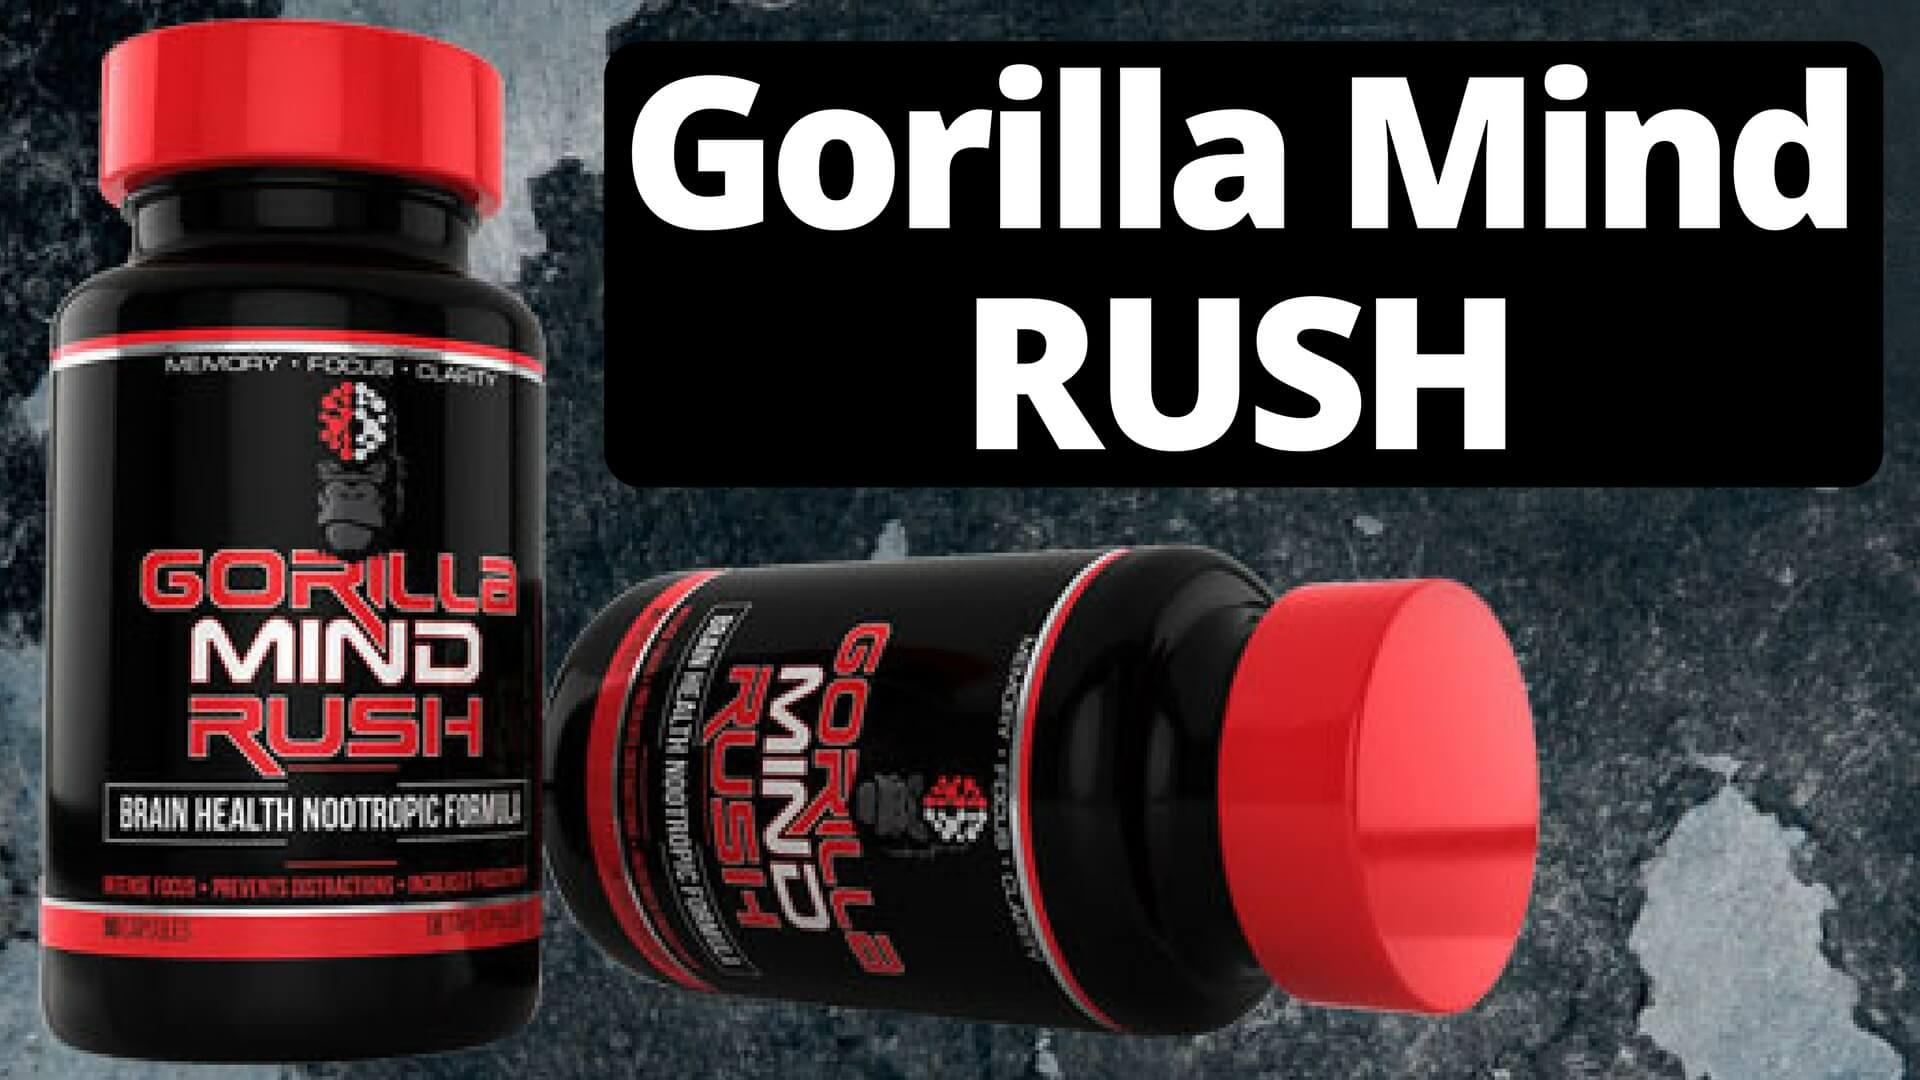 Two bottles of Gorilla Mind Rush